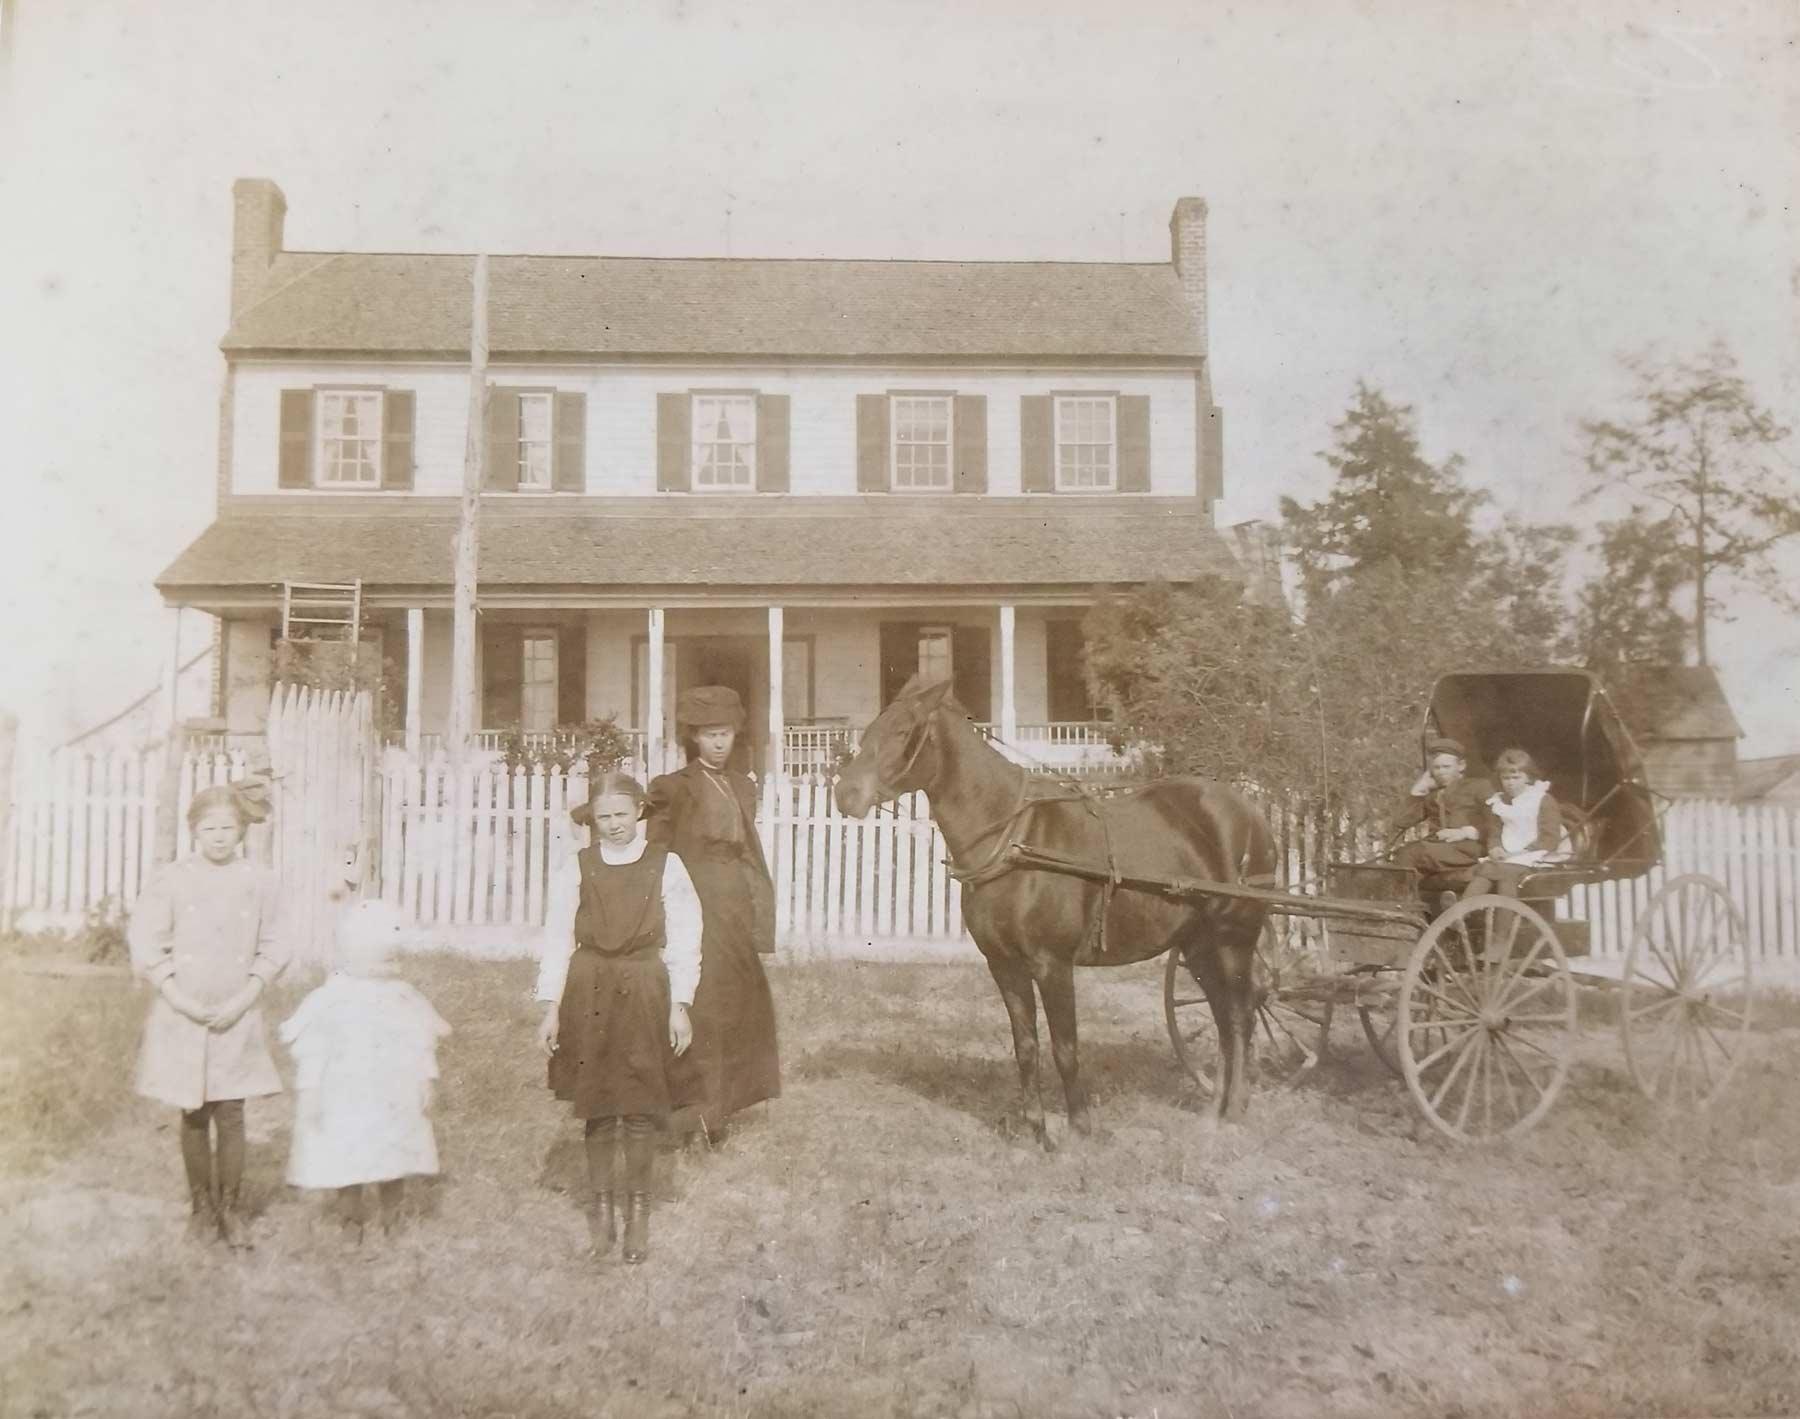 Jane Turner Place, Historic